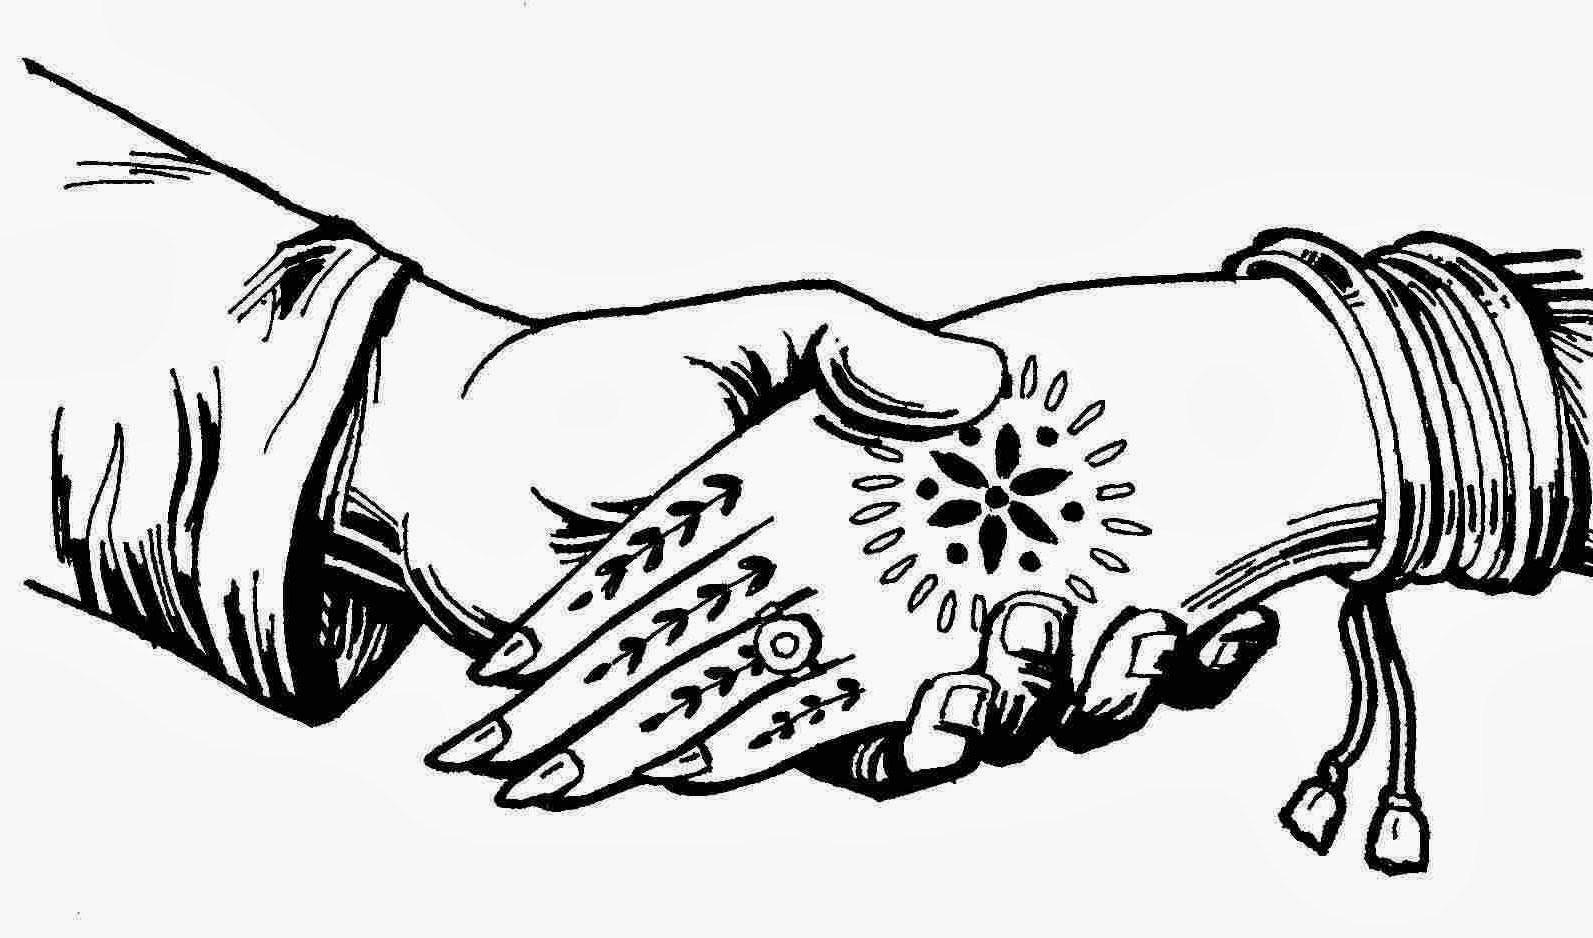 Wedding hand in hand clipart 1 » Clipart Portal.